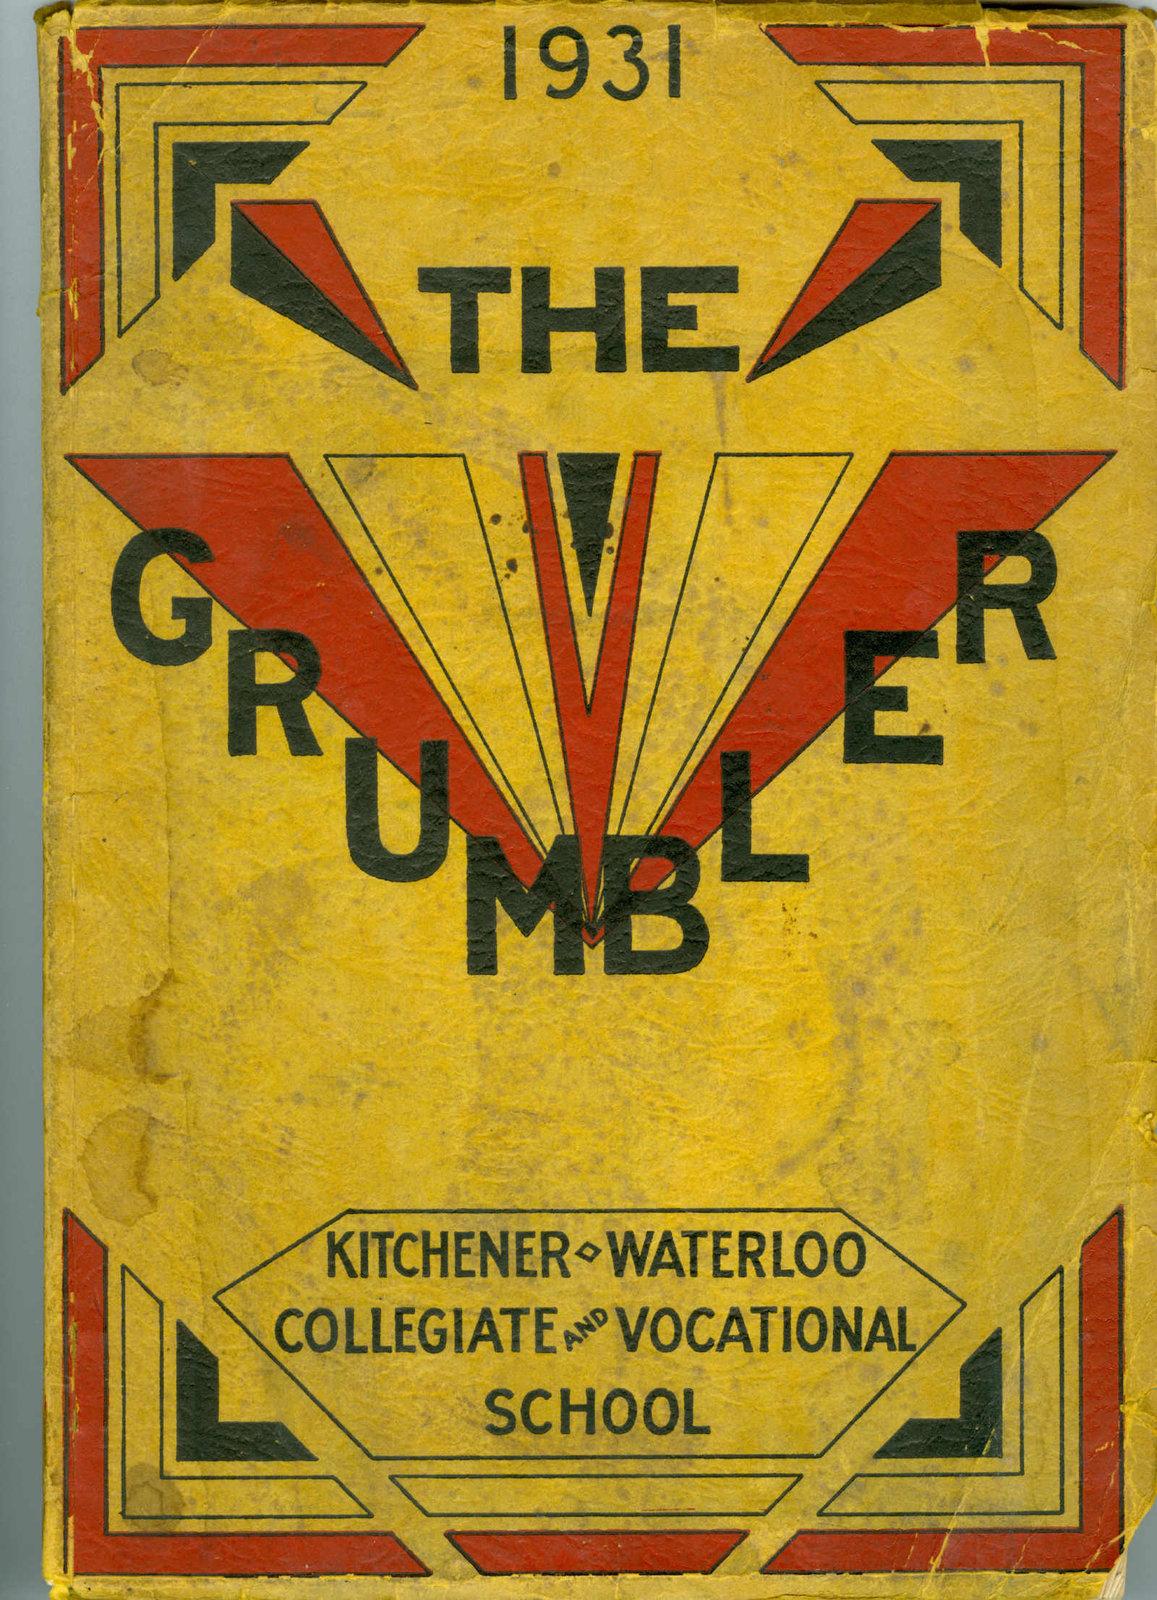 KCI Grumbler Year book, 1931